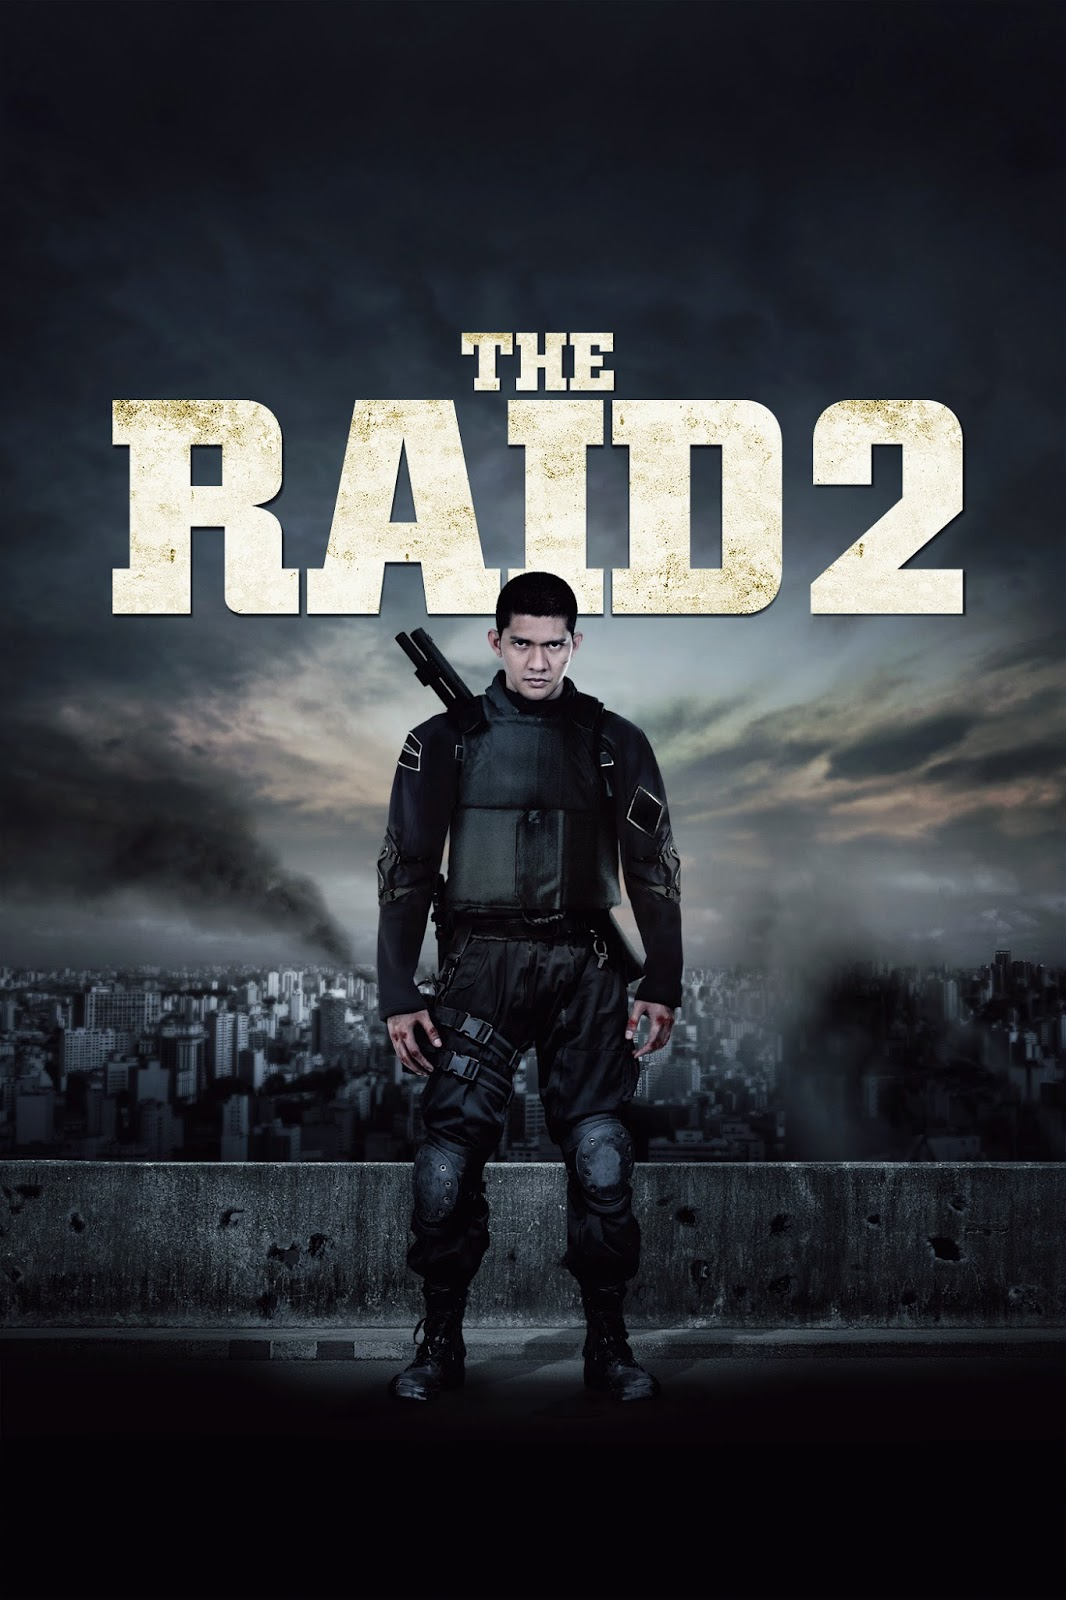 The Raid 2 Berandal ฉะ! ระห้ำเมือง [HD][พากย์ไทย]